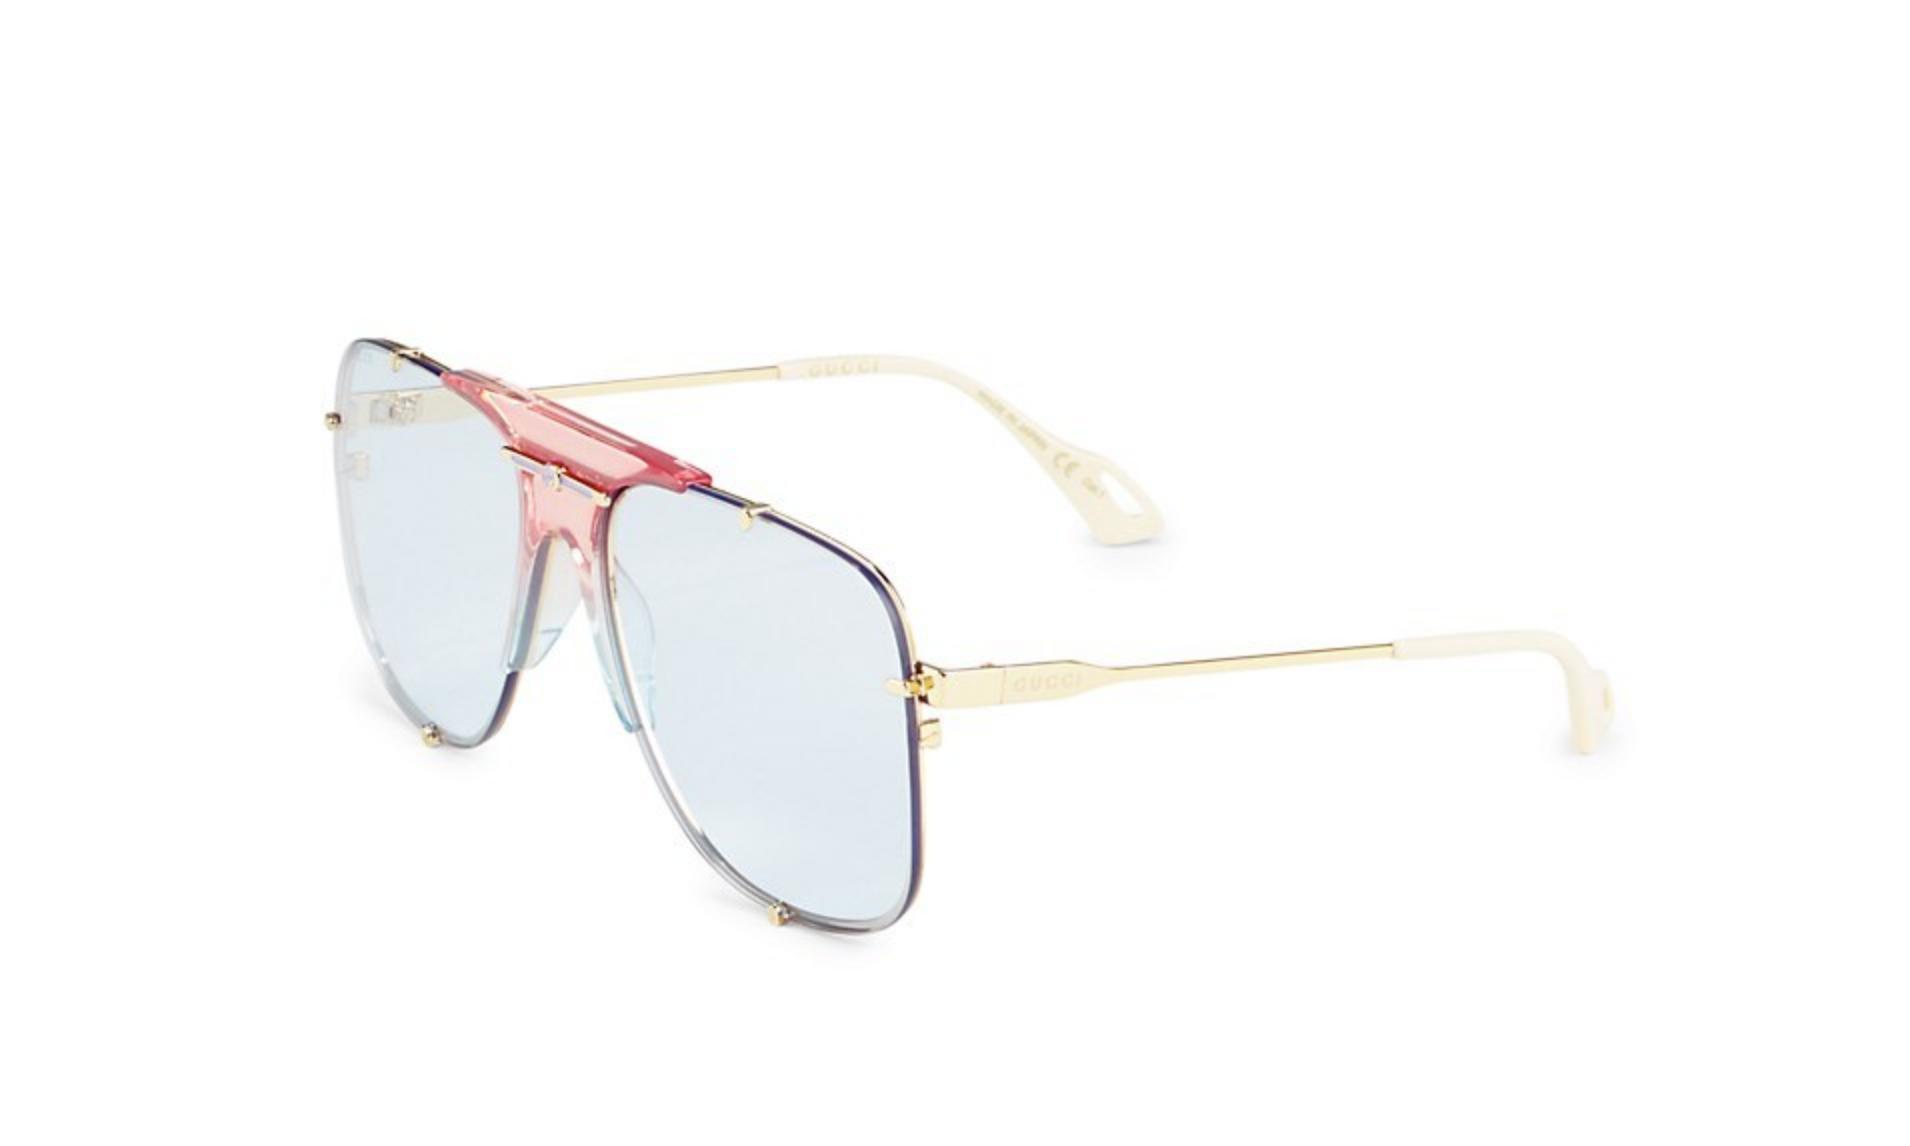 Gucci Gucci  Embellished Pilot Oversized Square Sunglasses